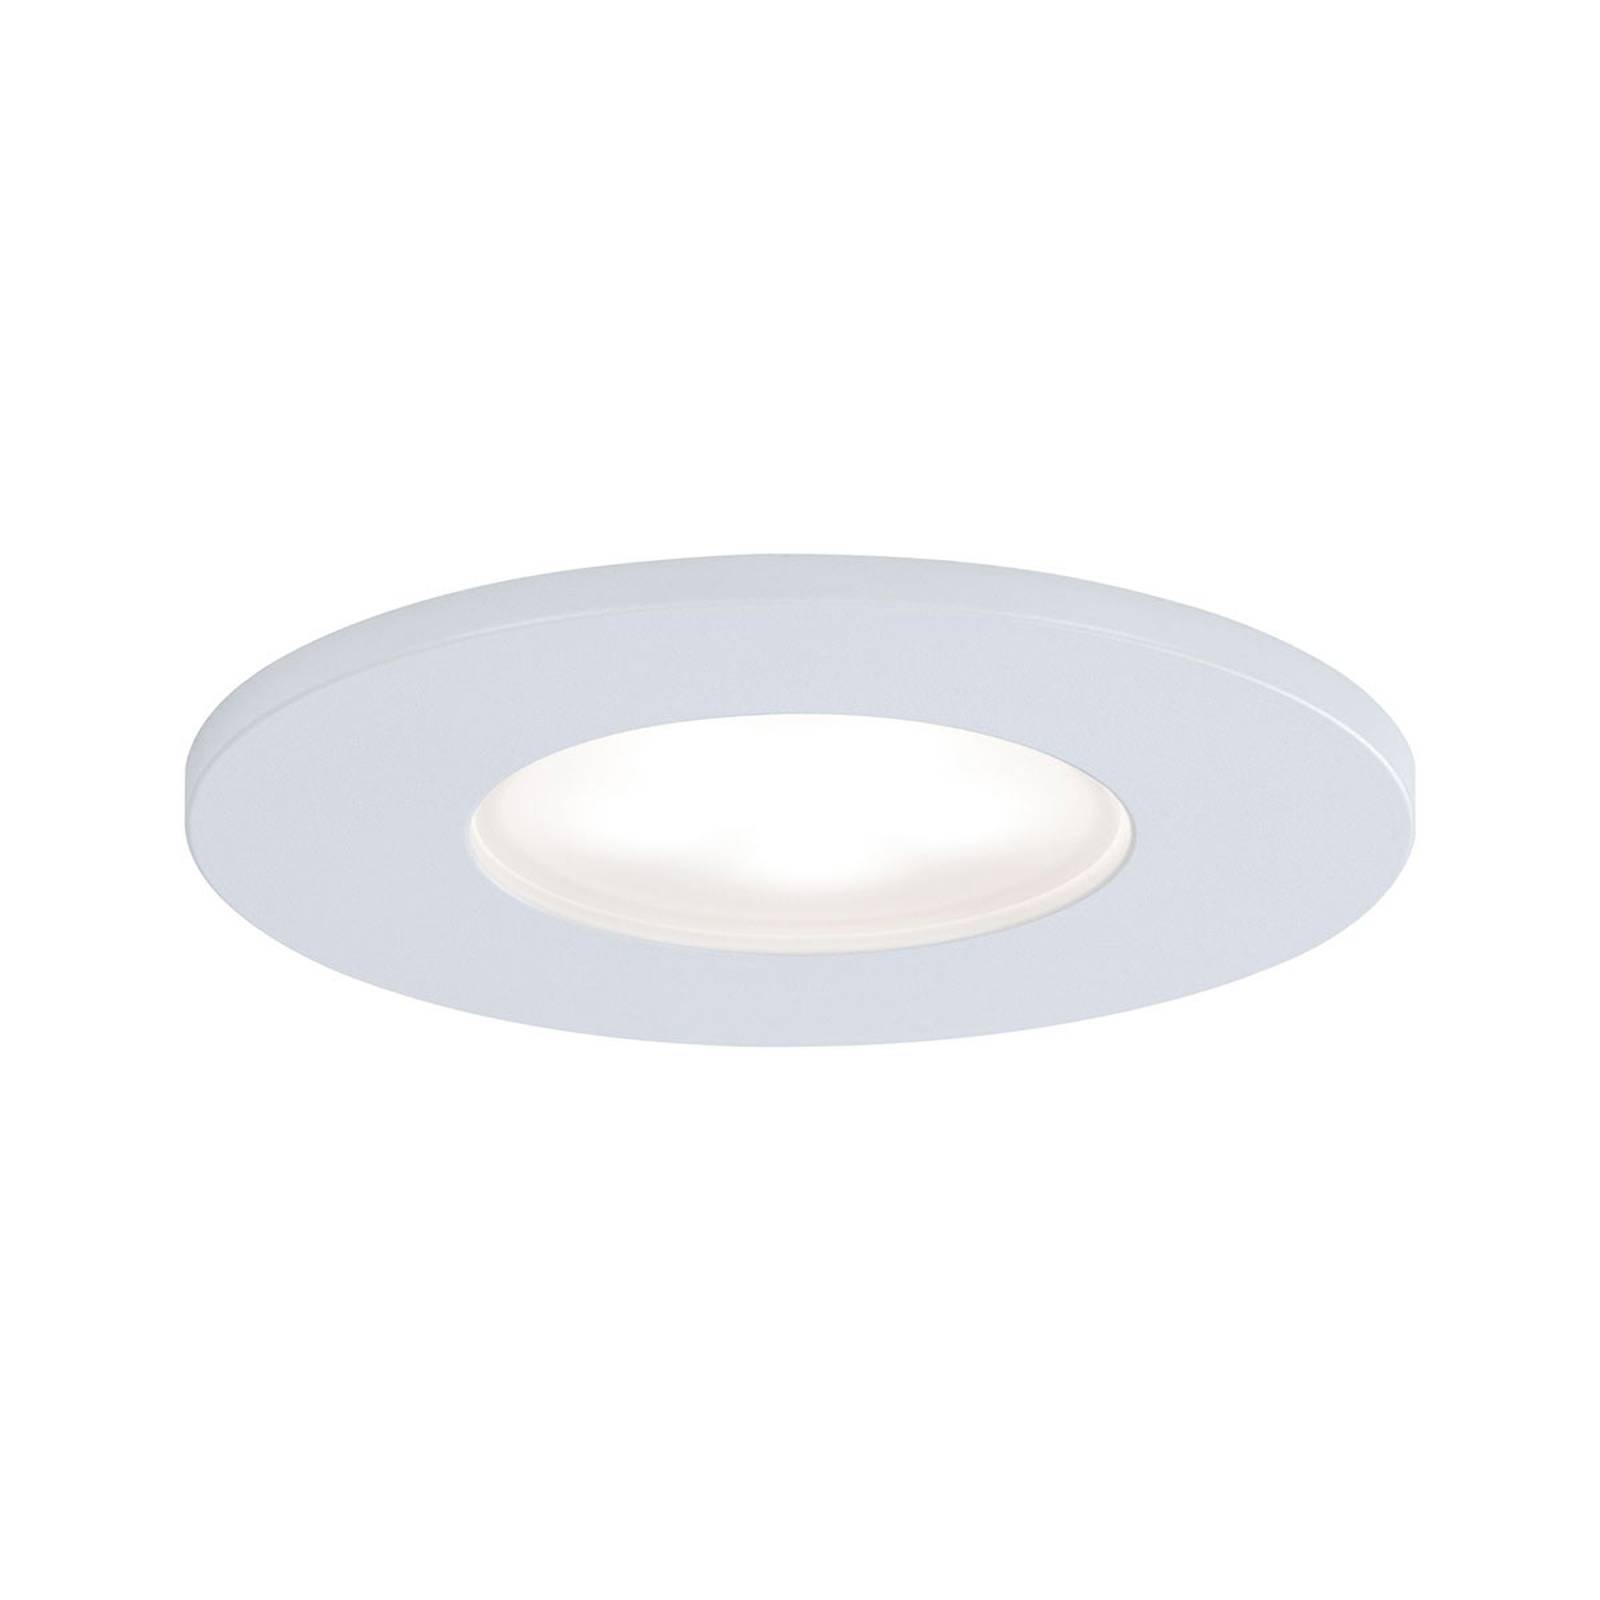 Paulmann LED buiten-inbouwspot Calla star wit